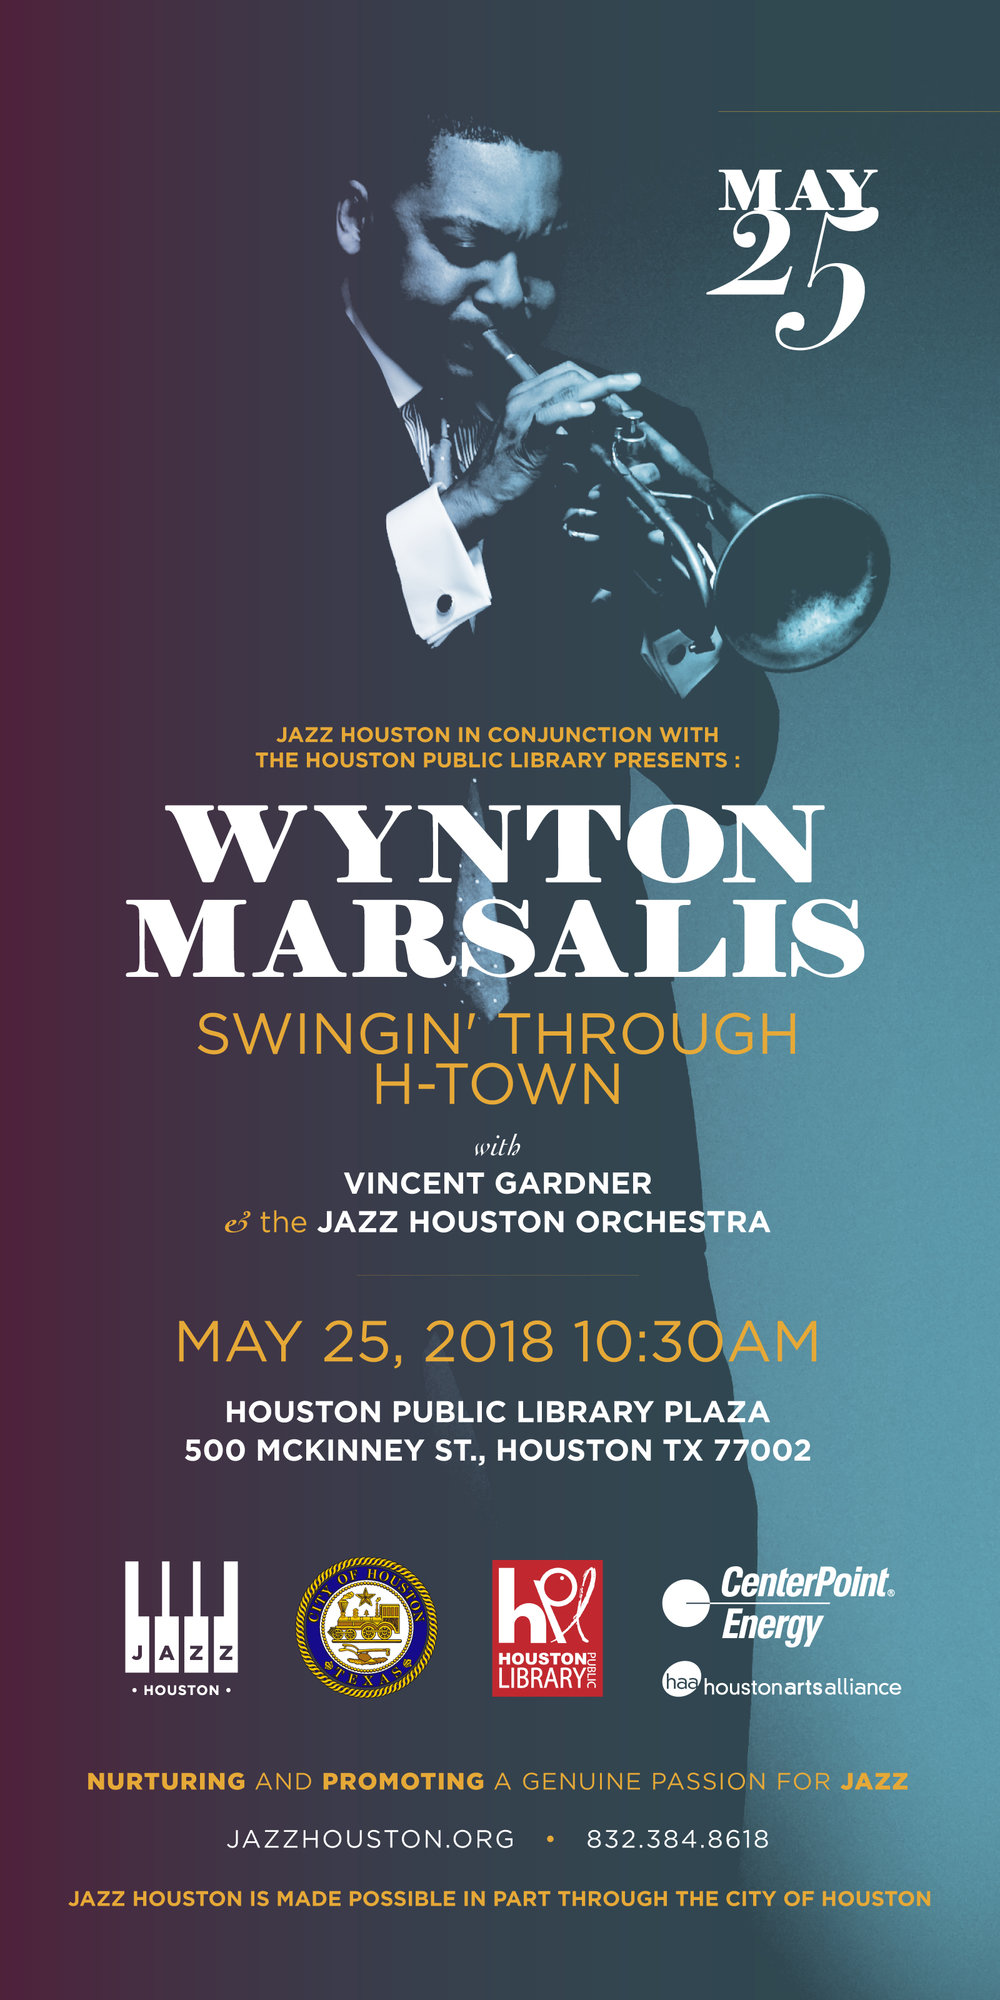 Wynton Marsalis - Digital Flier updated.jpg